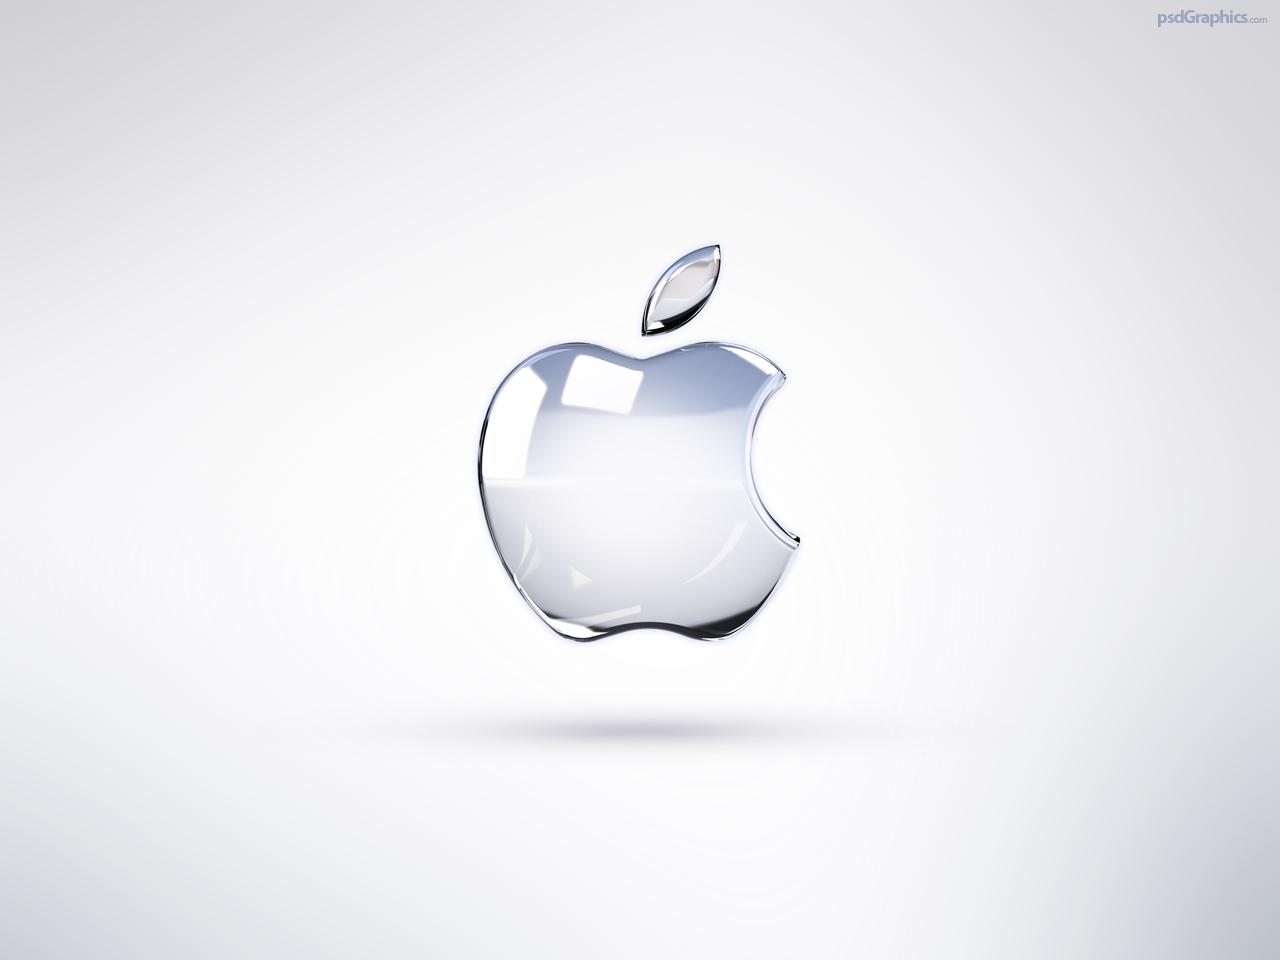 Apple logo wallpaper Wallpaper